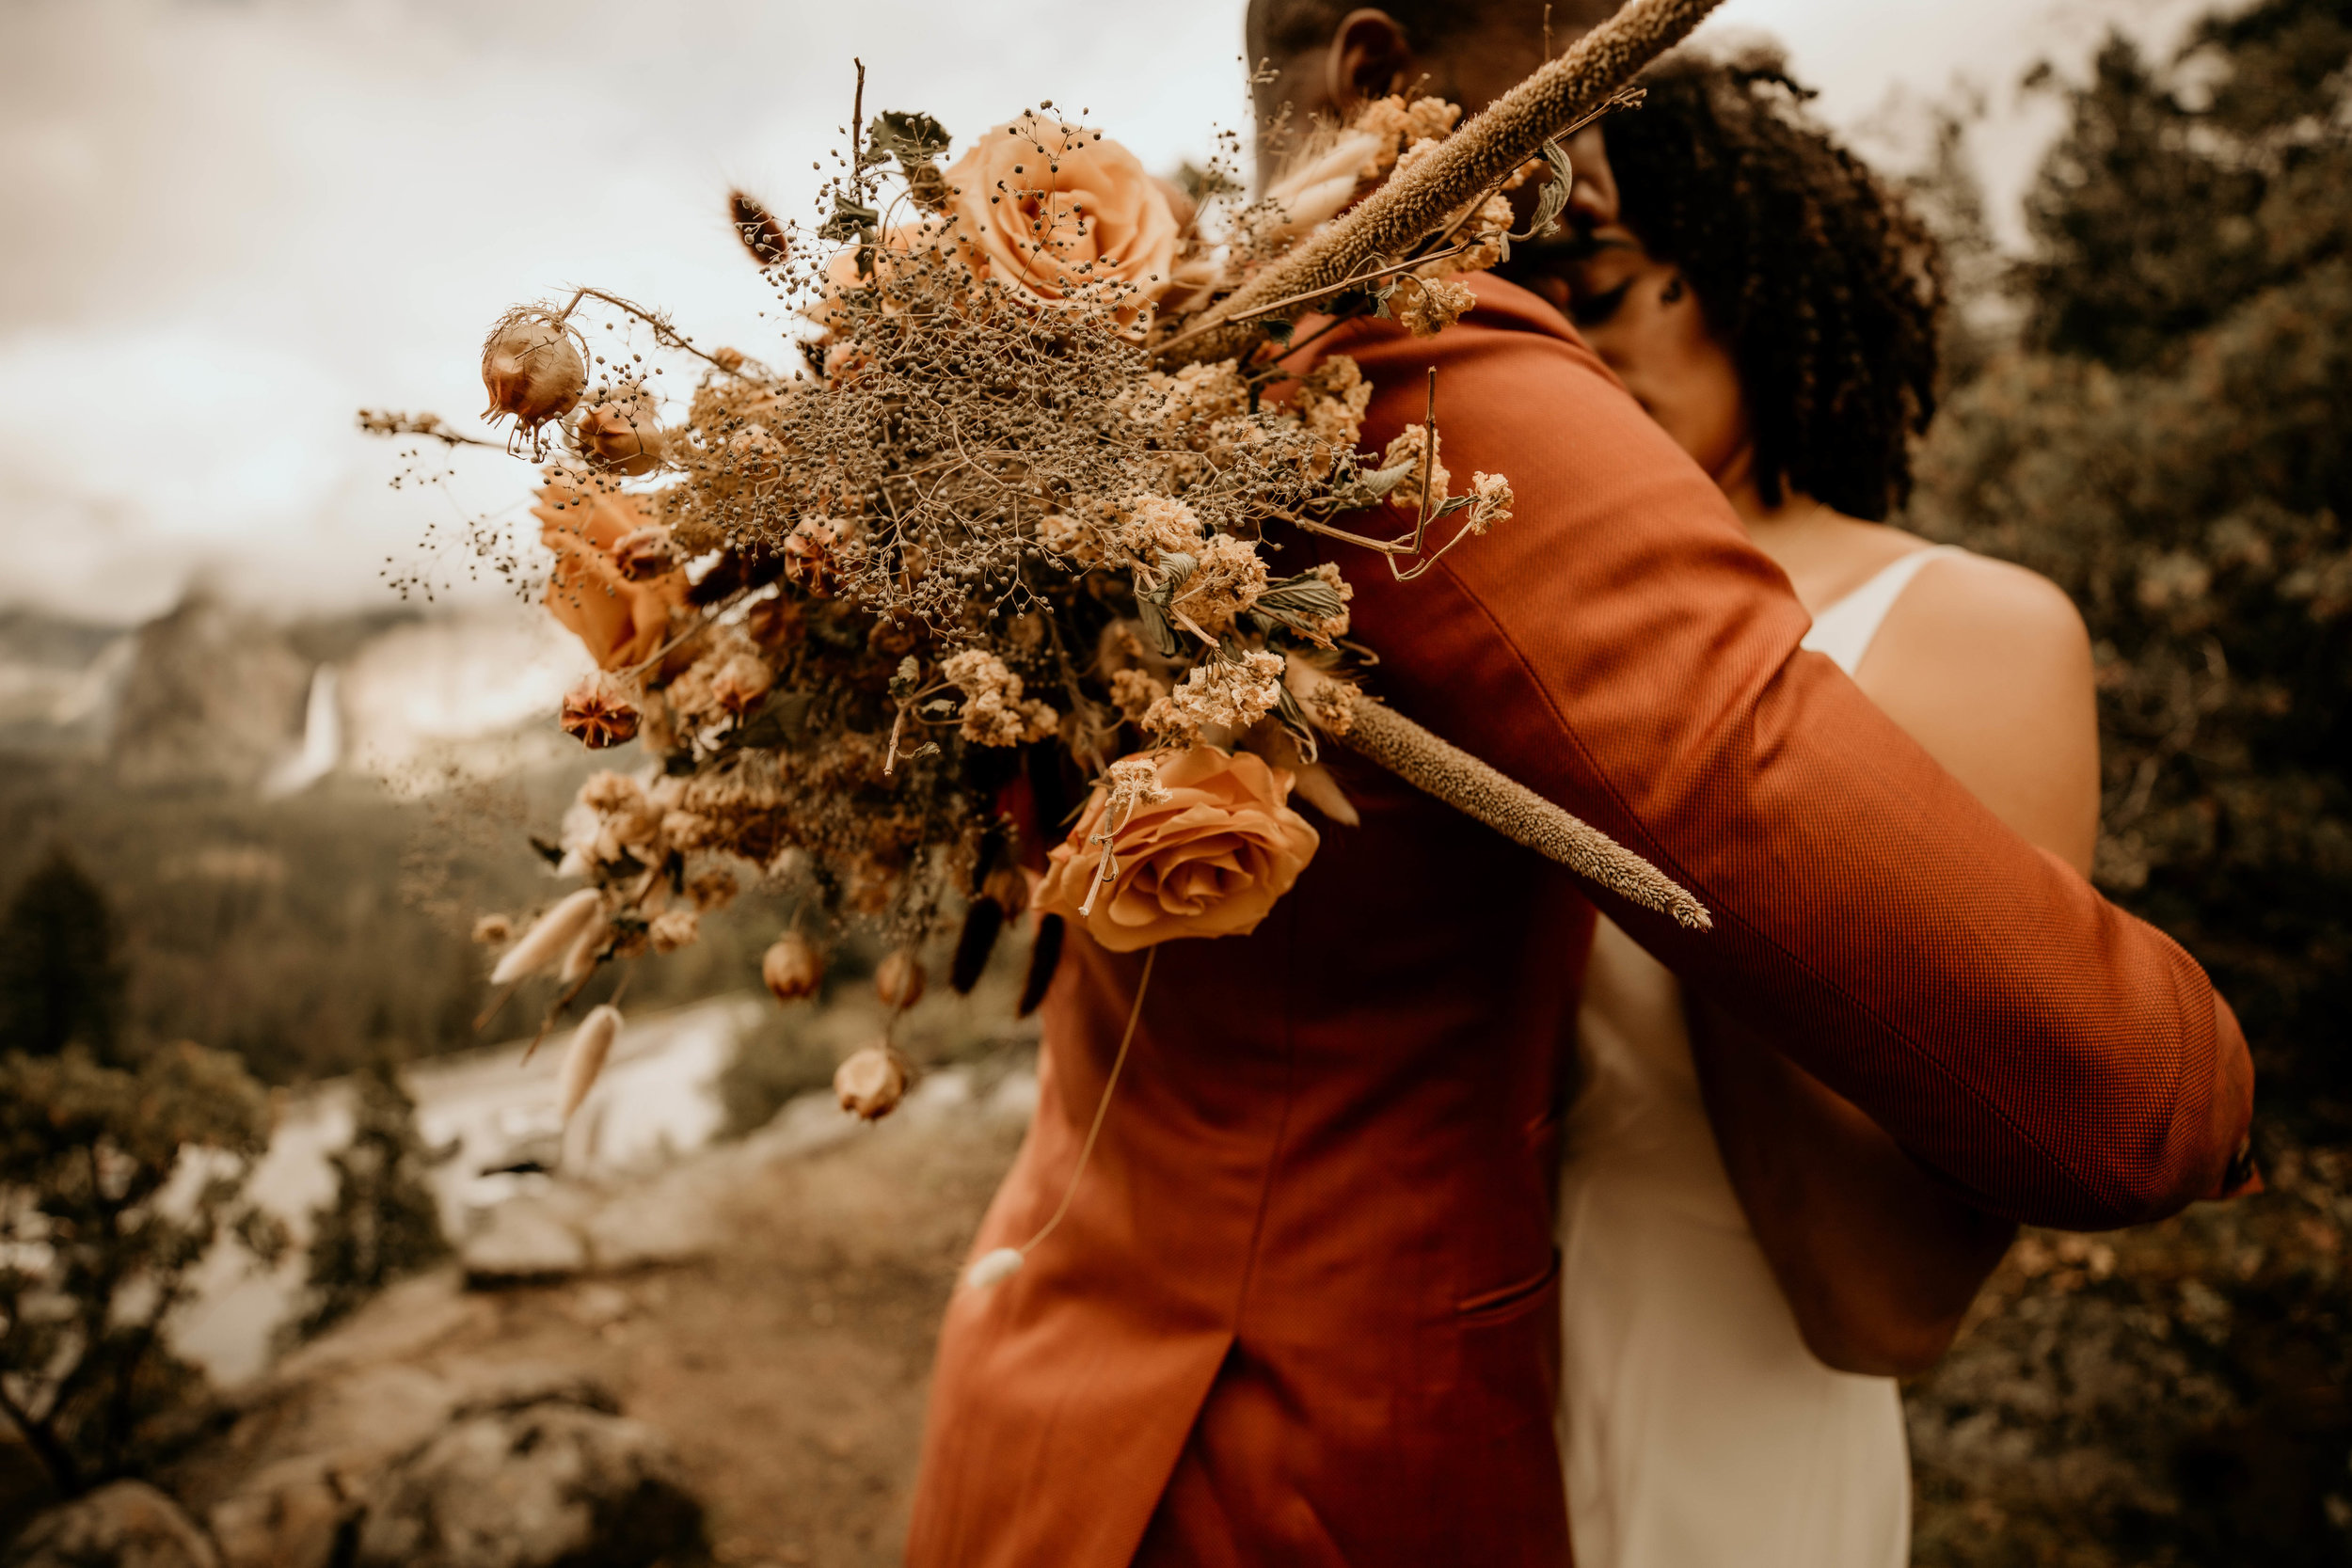 1yosimite-national-park-elopement-wedding-boho-bride--4.jpg